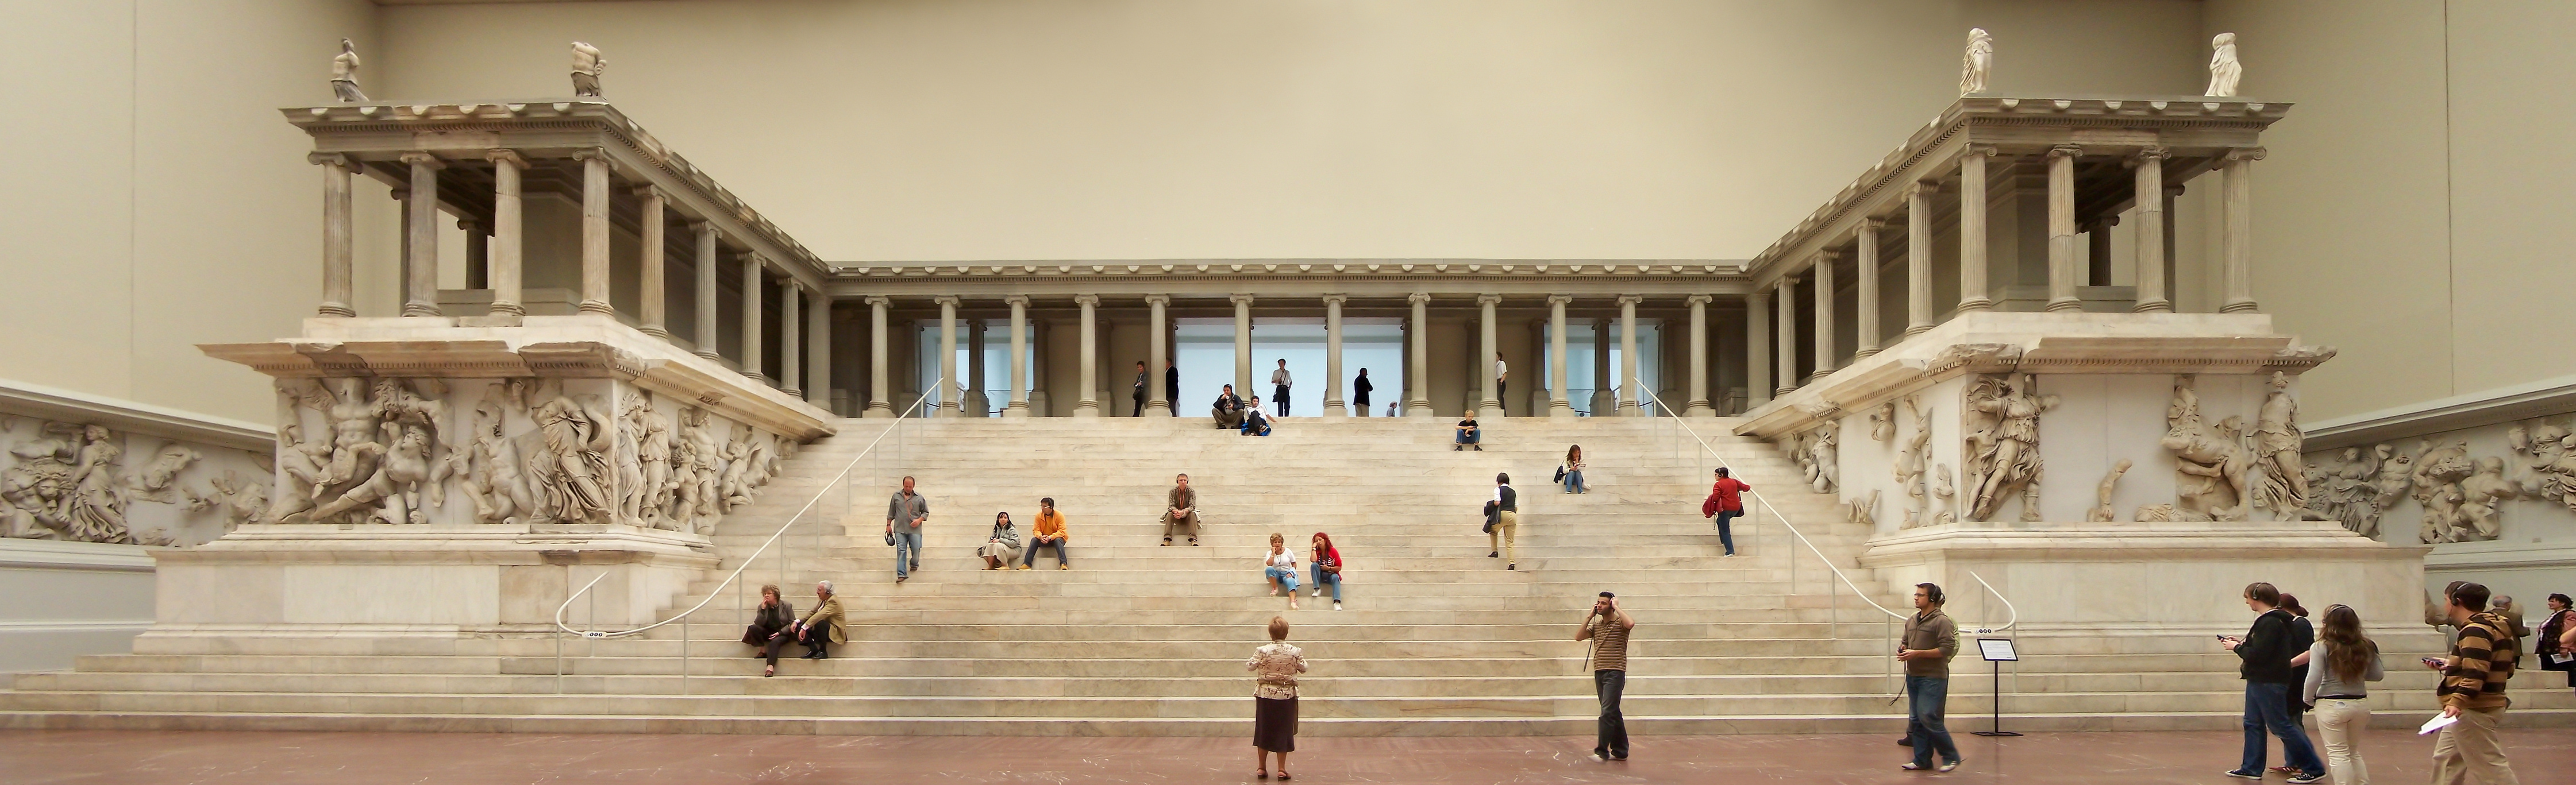 Berlin - Pergamonmuseum - Altar 01.jpg